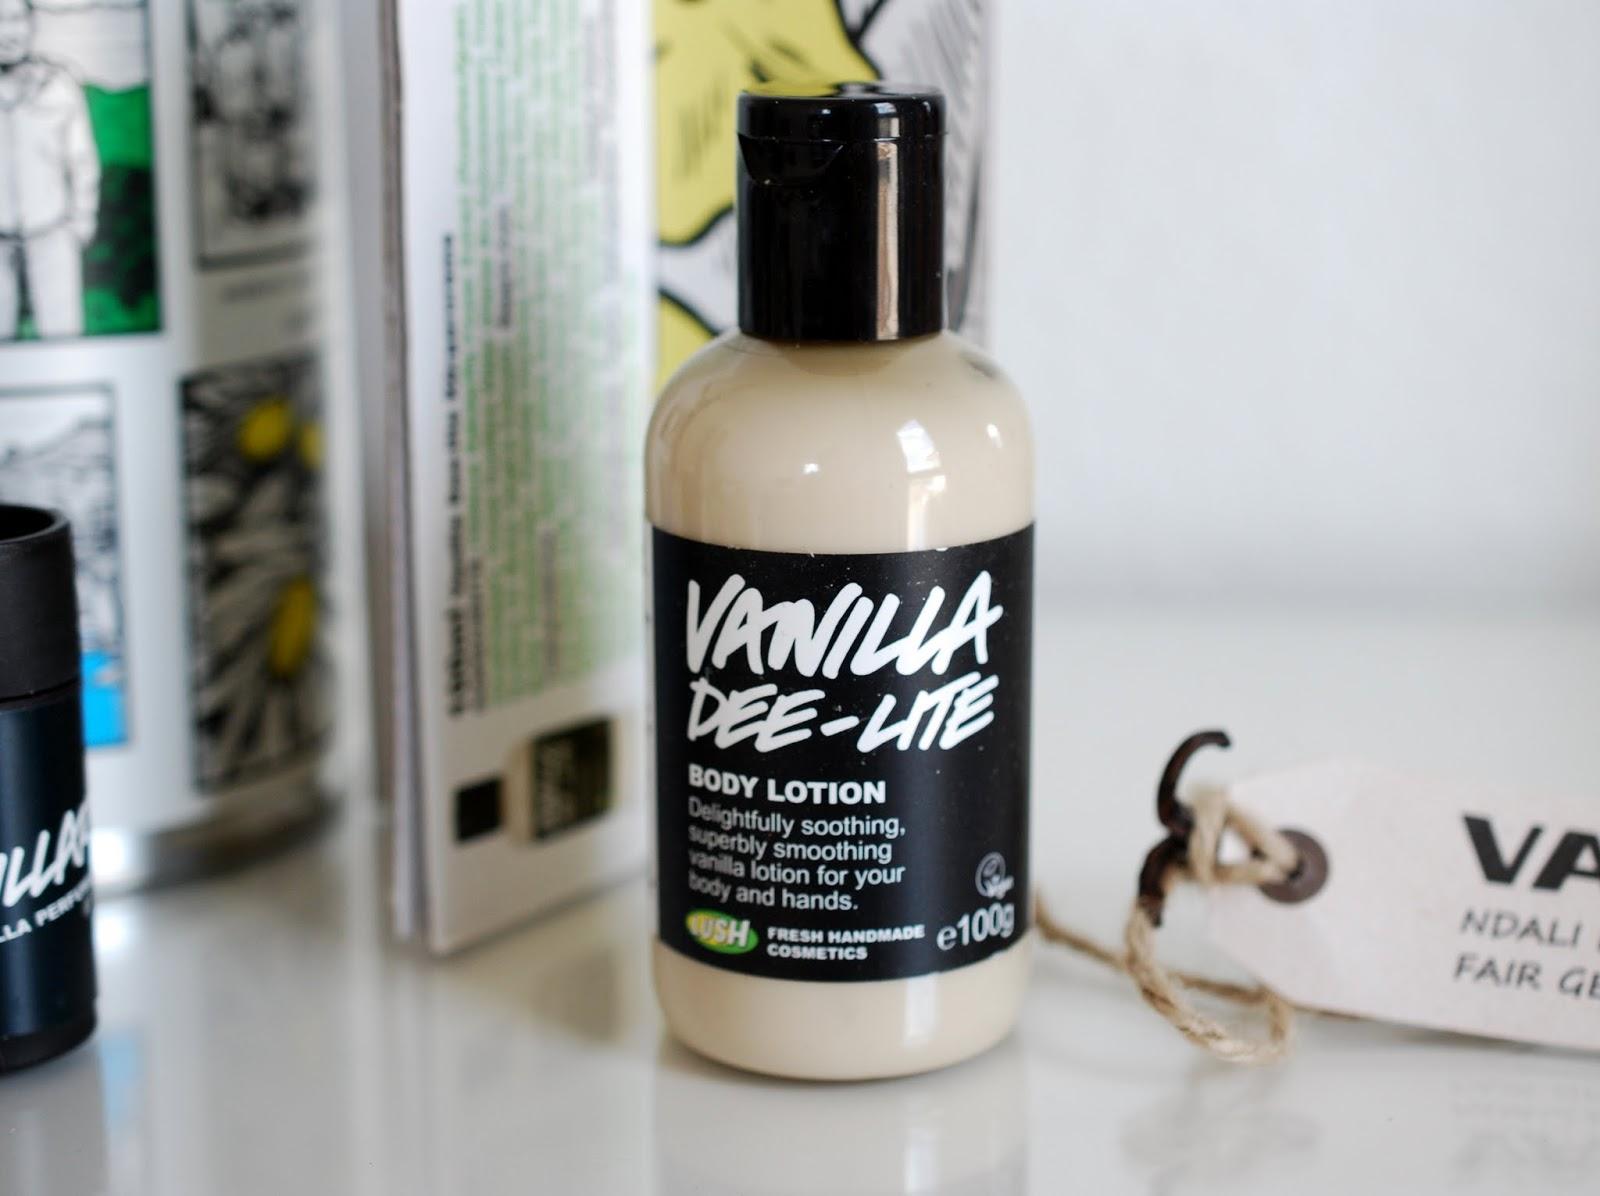 Lush Vanilla Dee-Lite Body Lotion